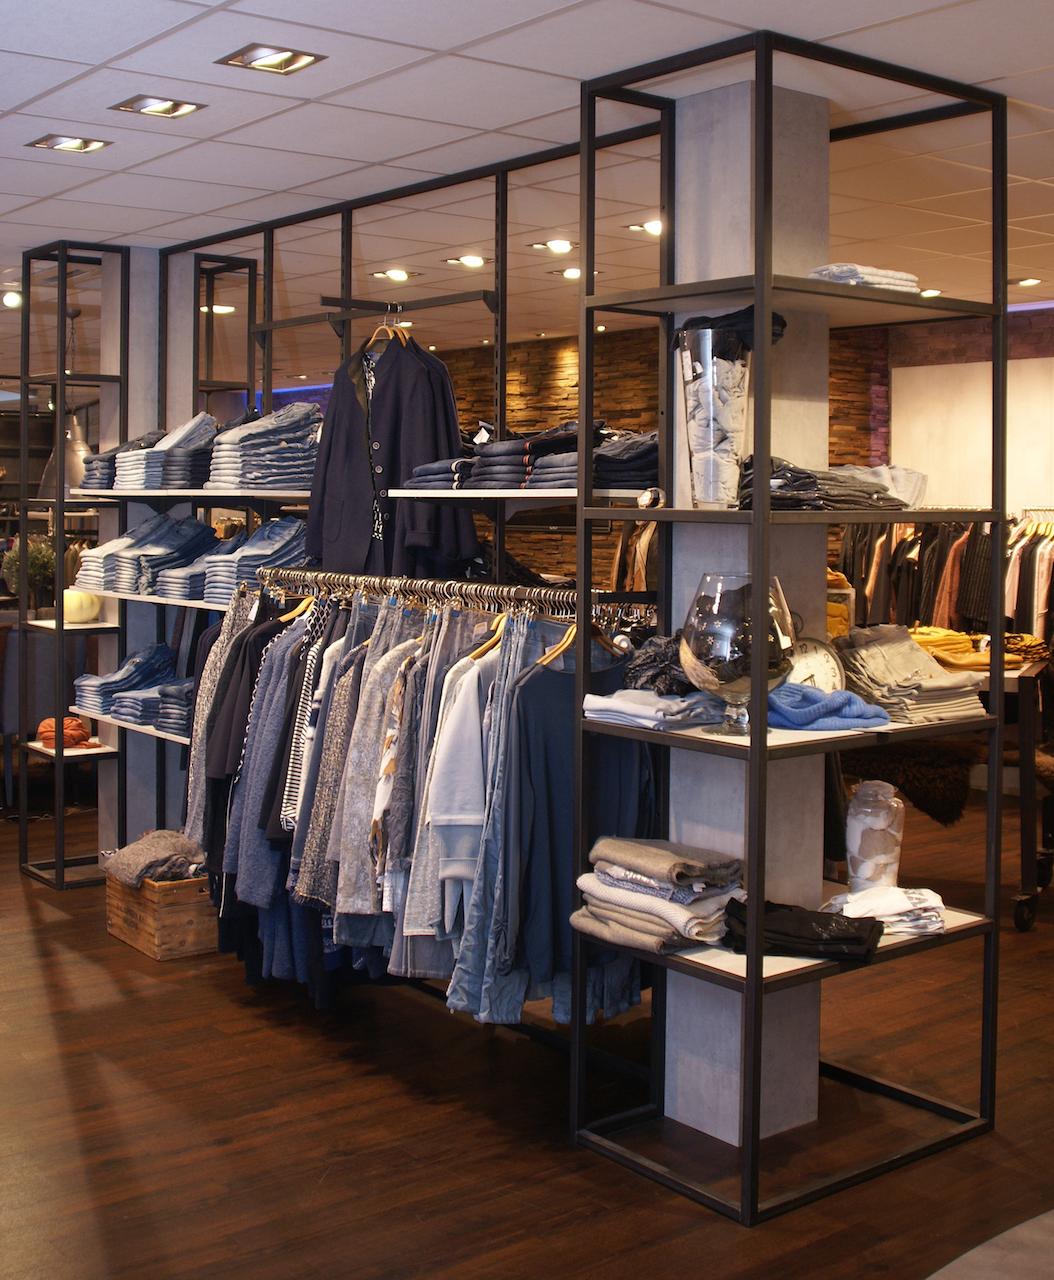 Industrieel winkelinterieur met stalen kledingschappen en stalen kozijn